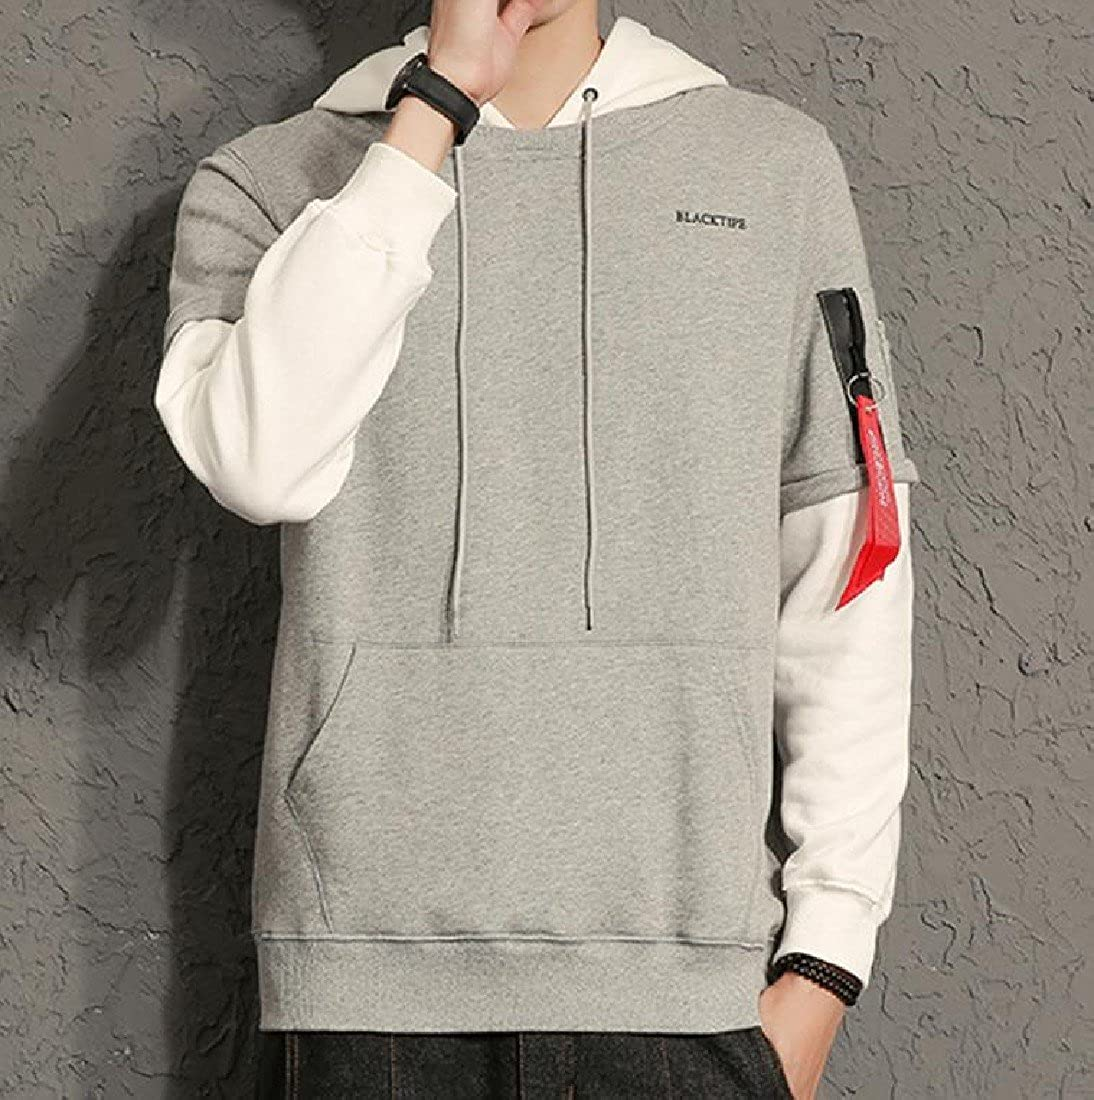 Sheng Xi Mens Loose Fit Splice Big Pockets Thin Hoodies Tops Outwear